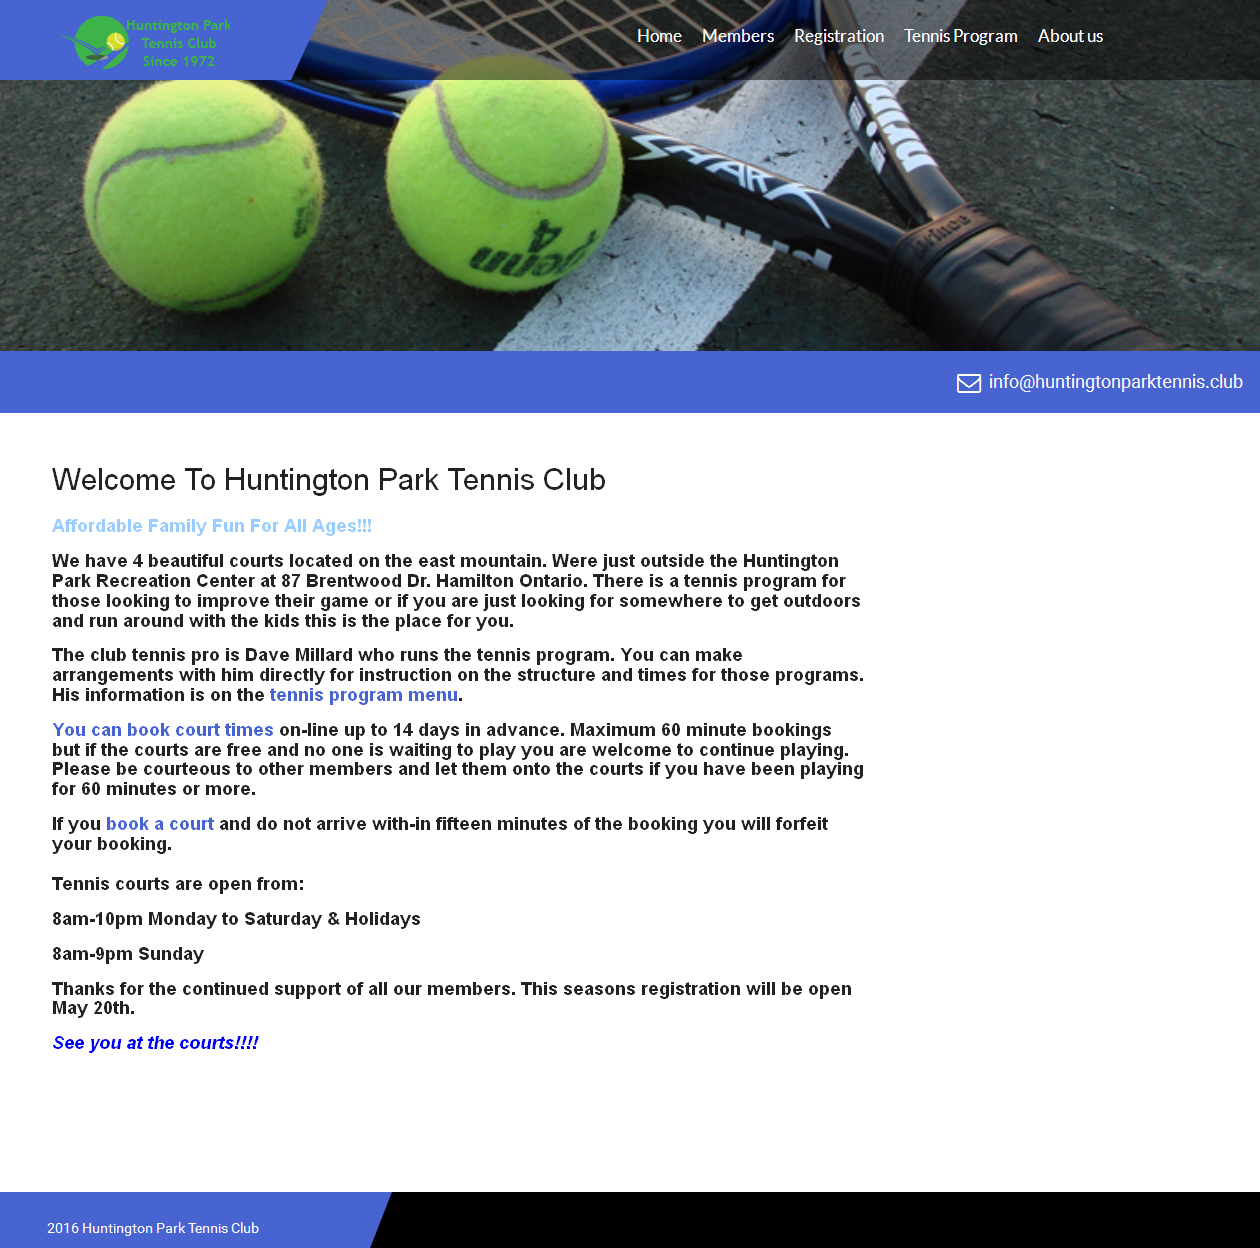 Huntington Park Tennis Club